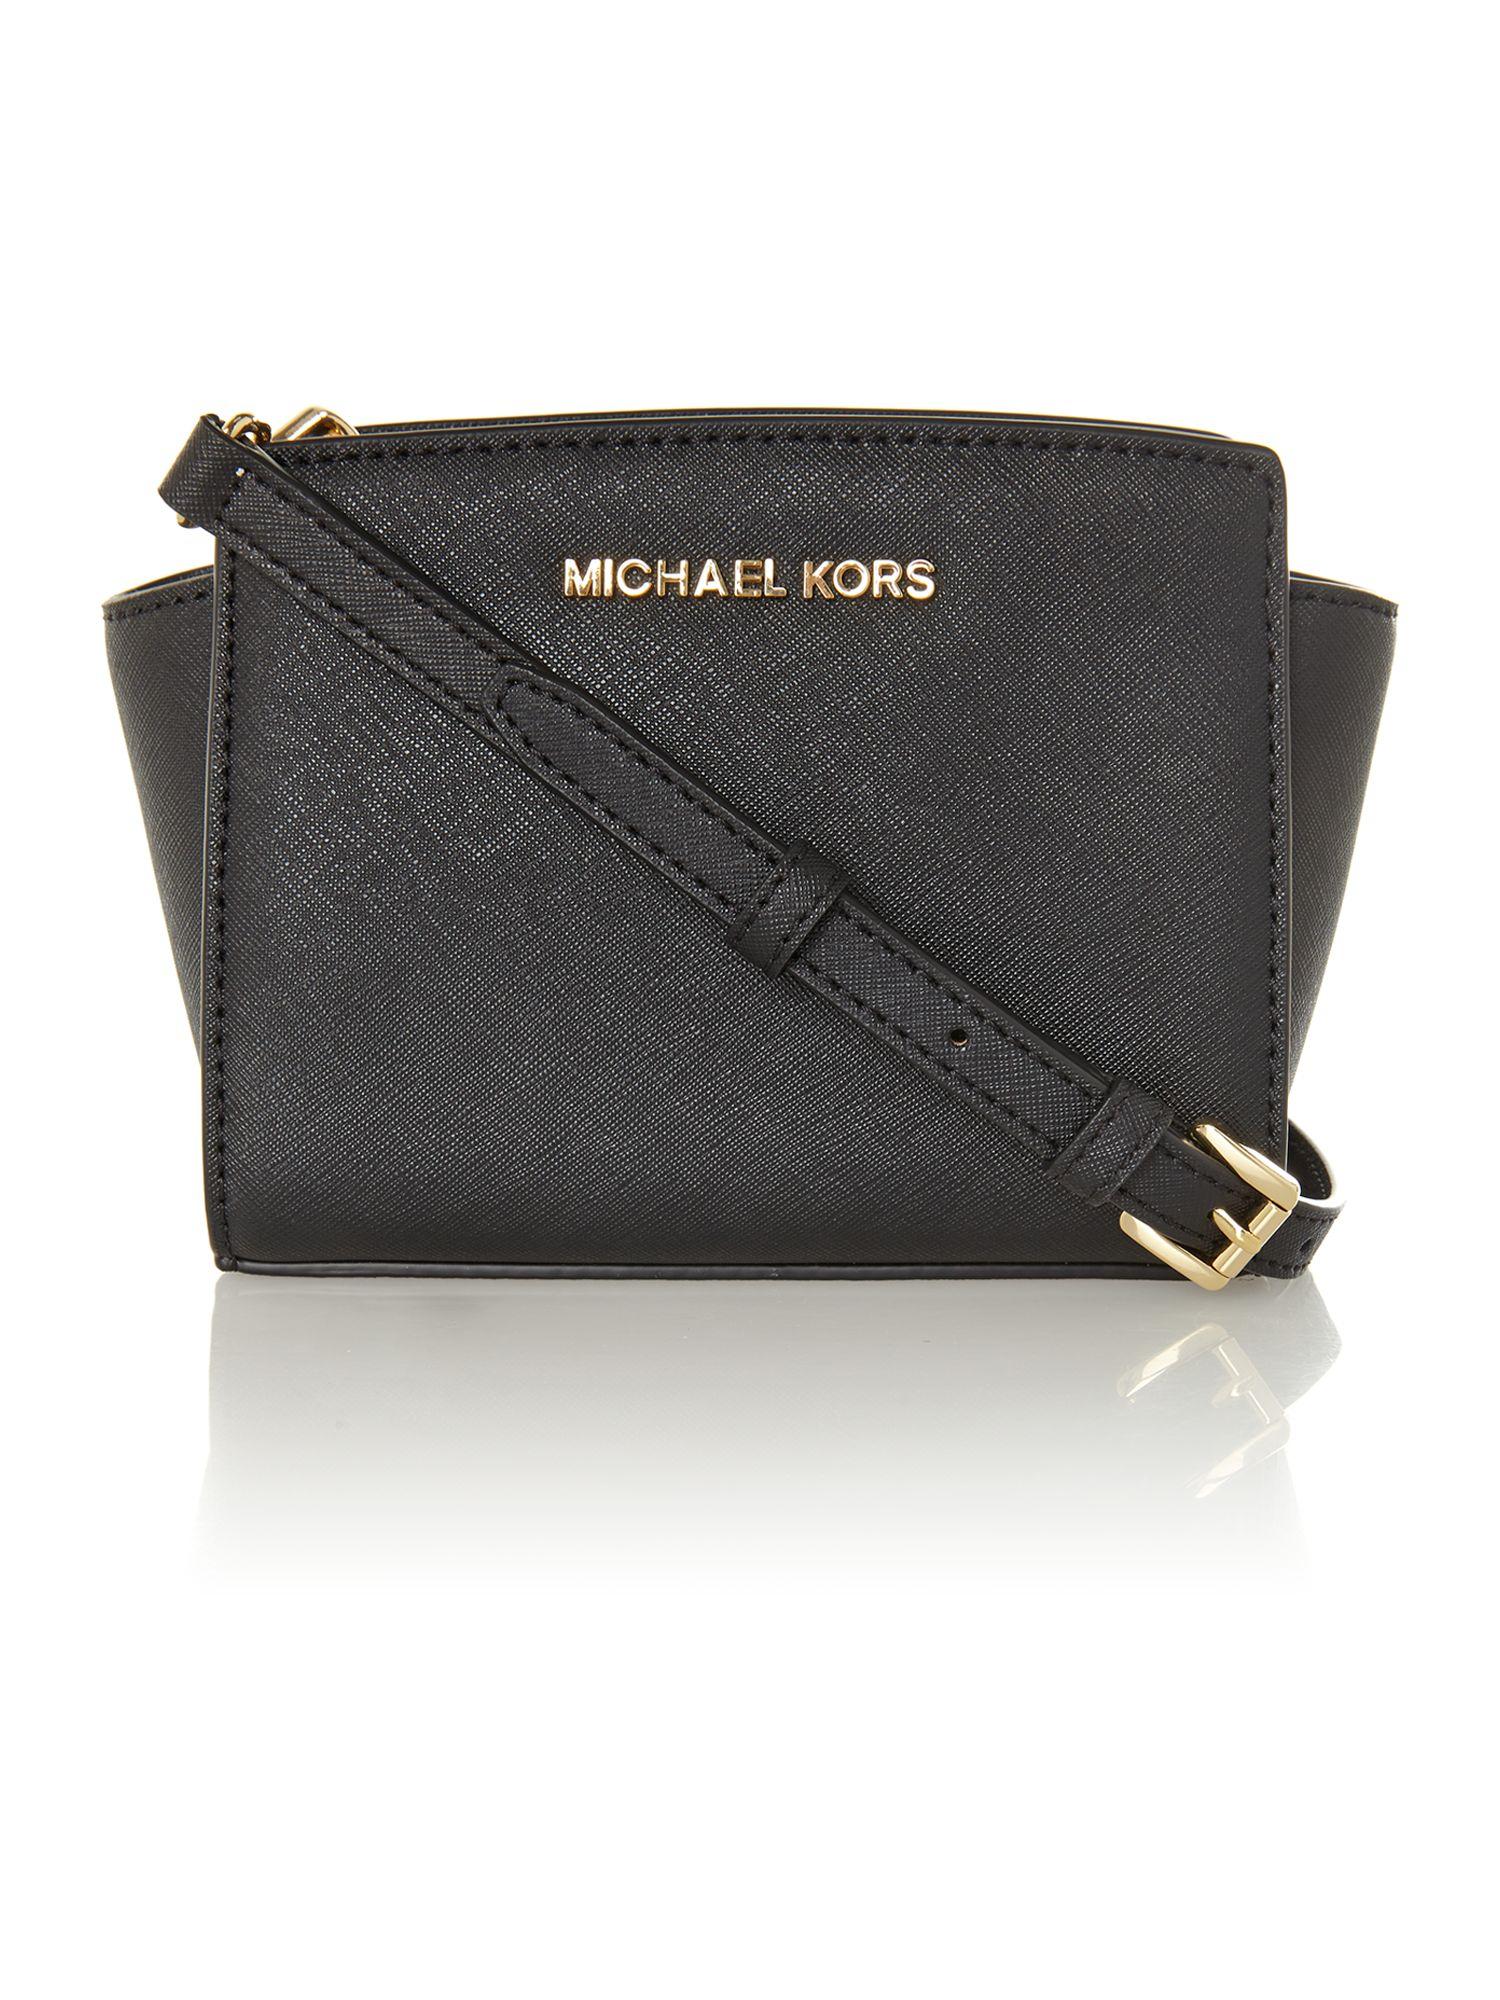 088c8e17bb041a Michael Kors Selma Black Mini Cross Body Bag | Stanford Center for ...